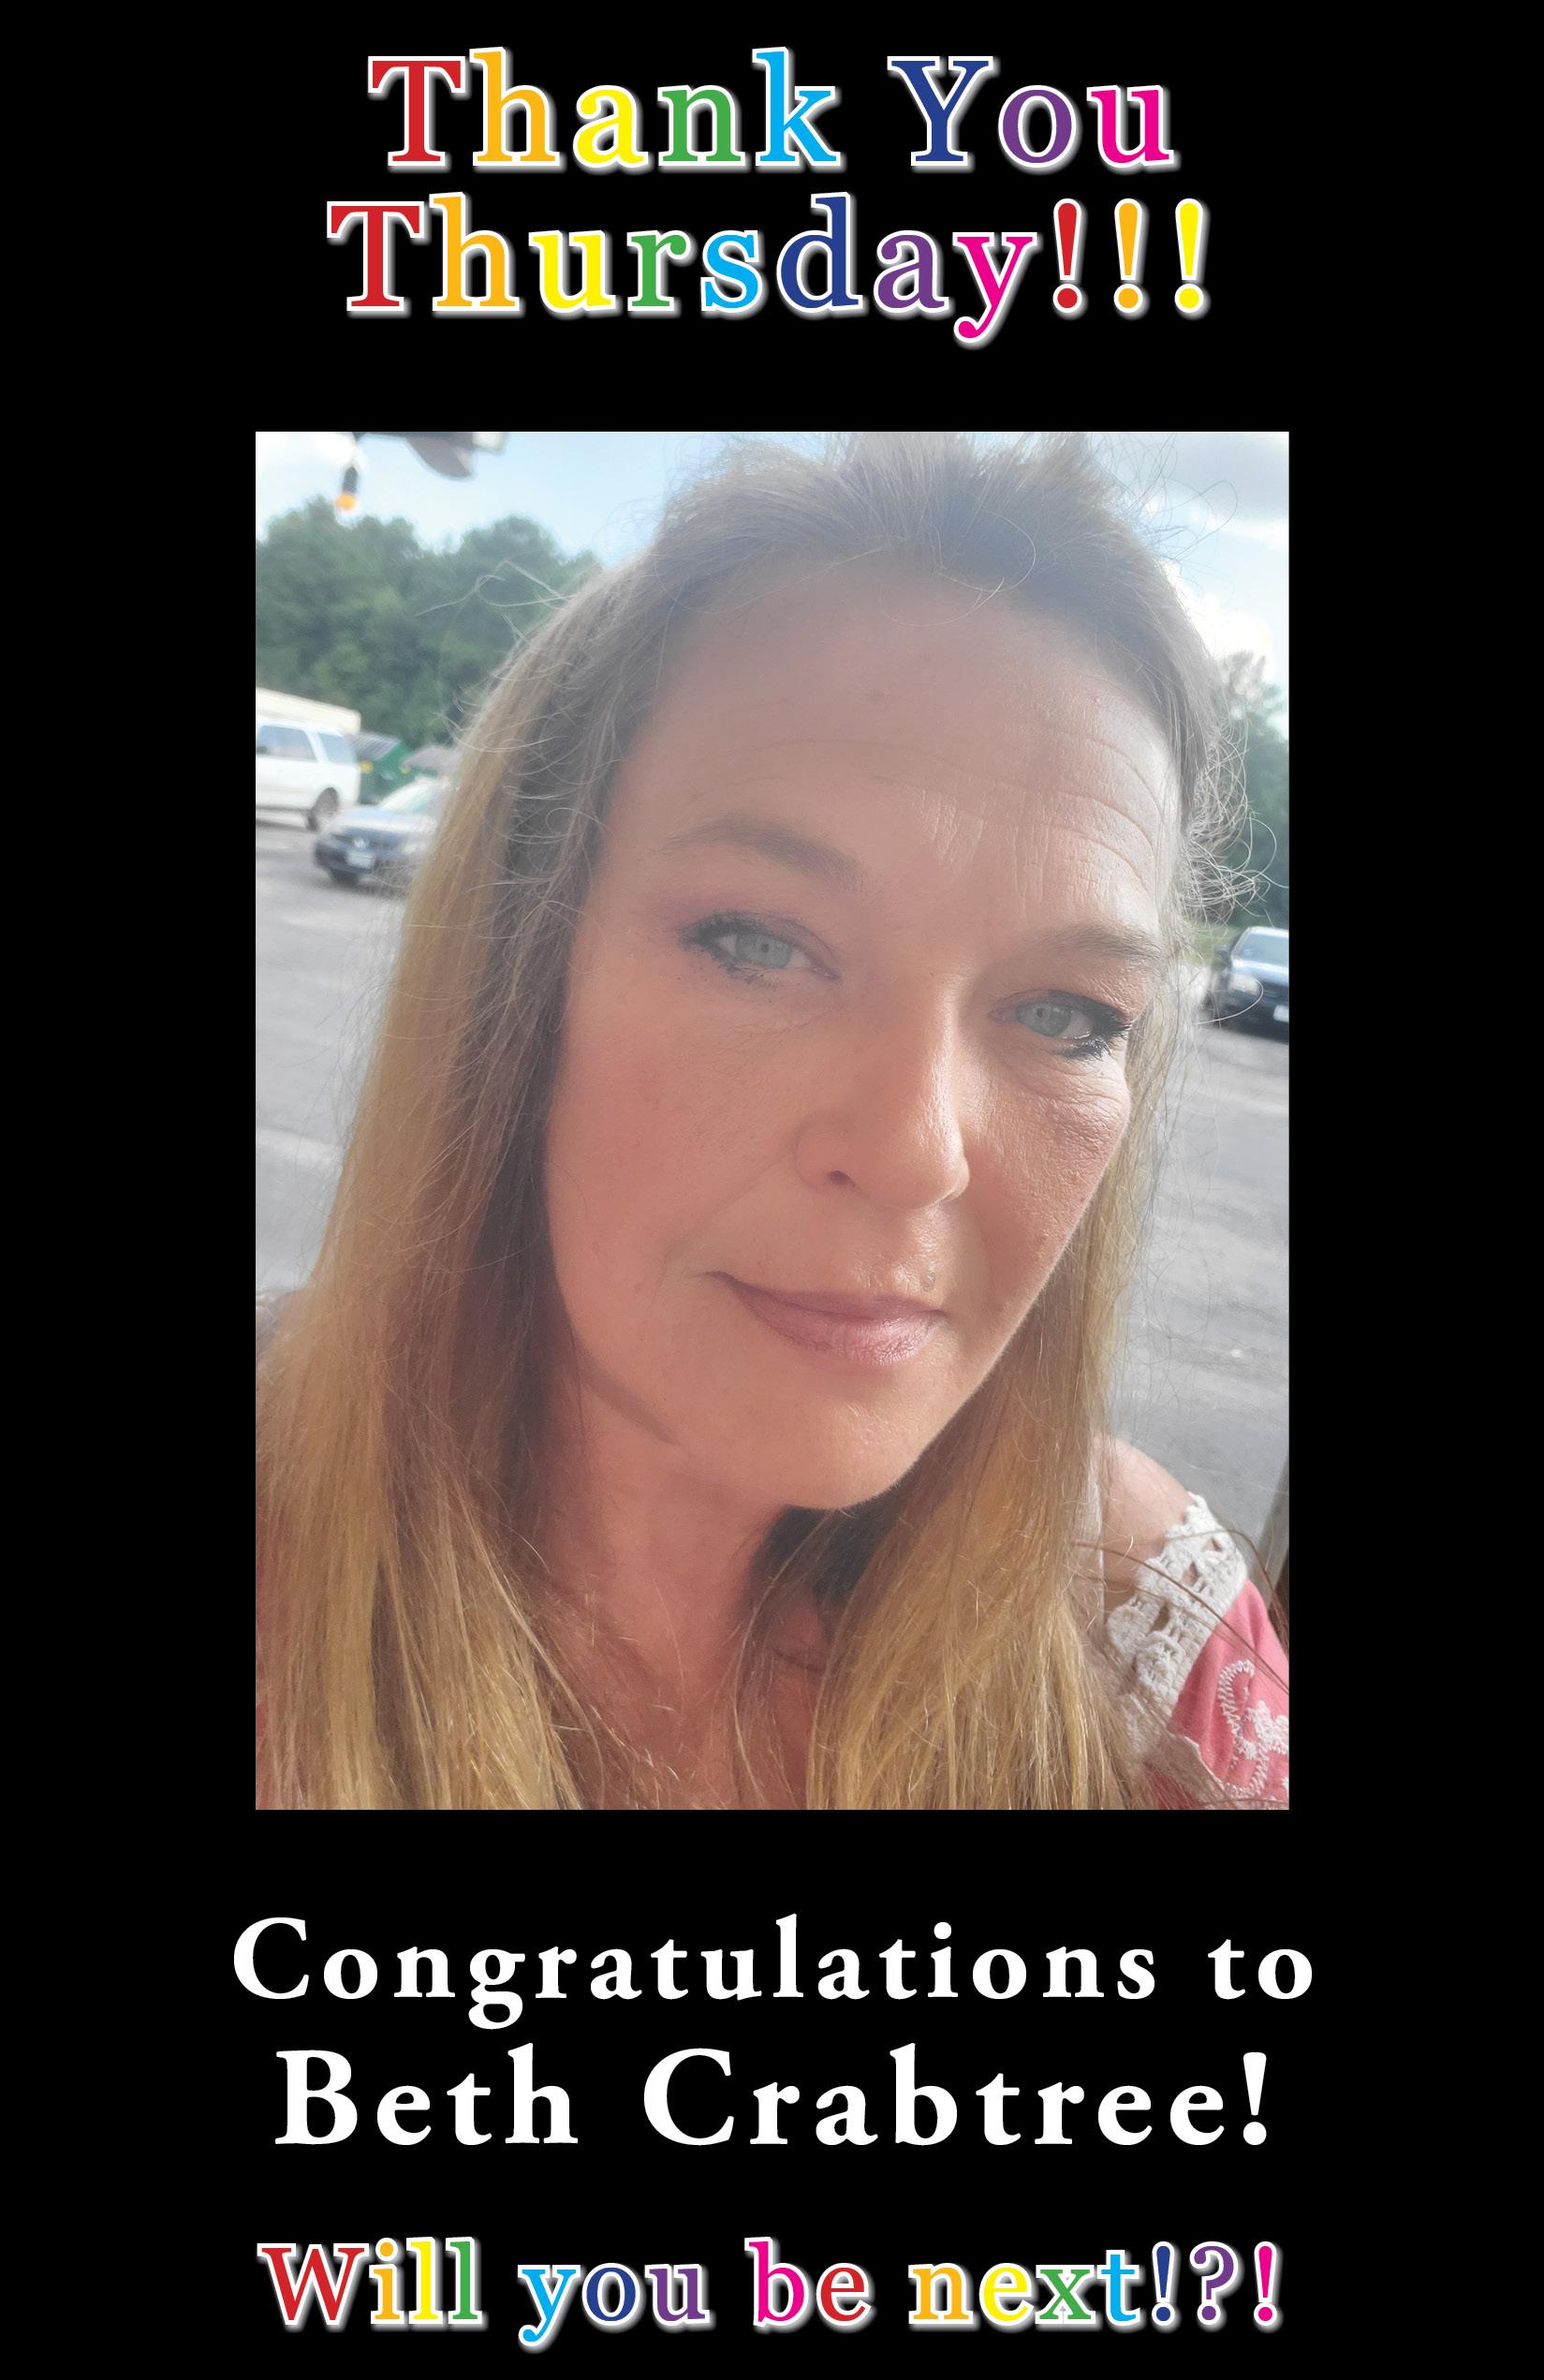 Thank You Thursday recipient Beth Crabtree